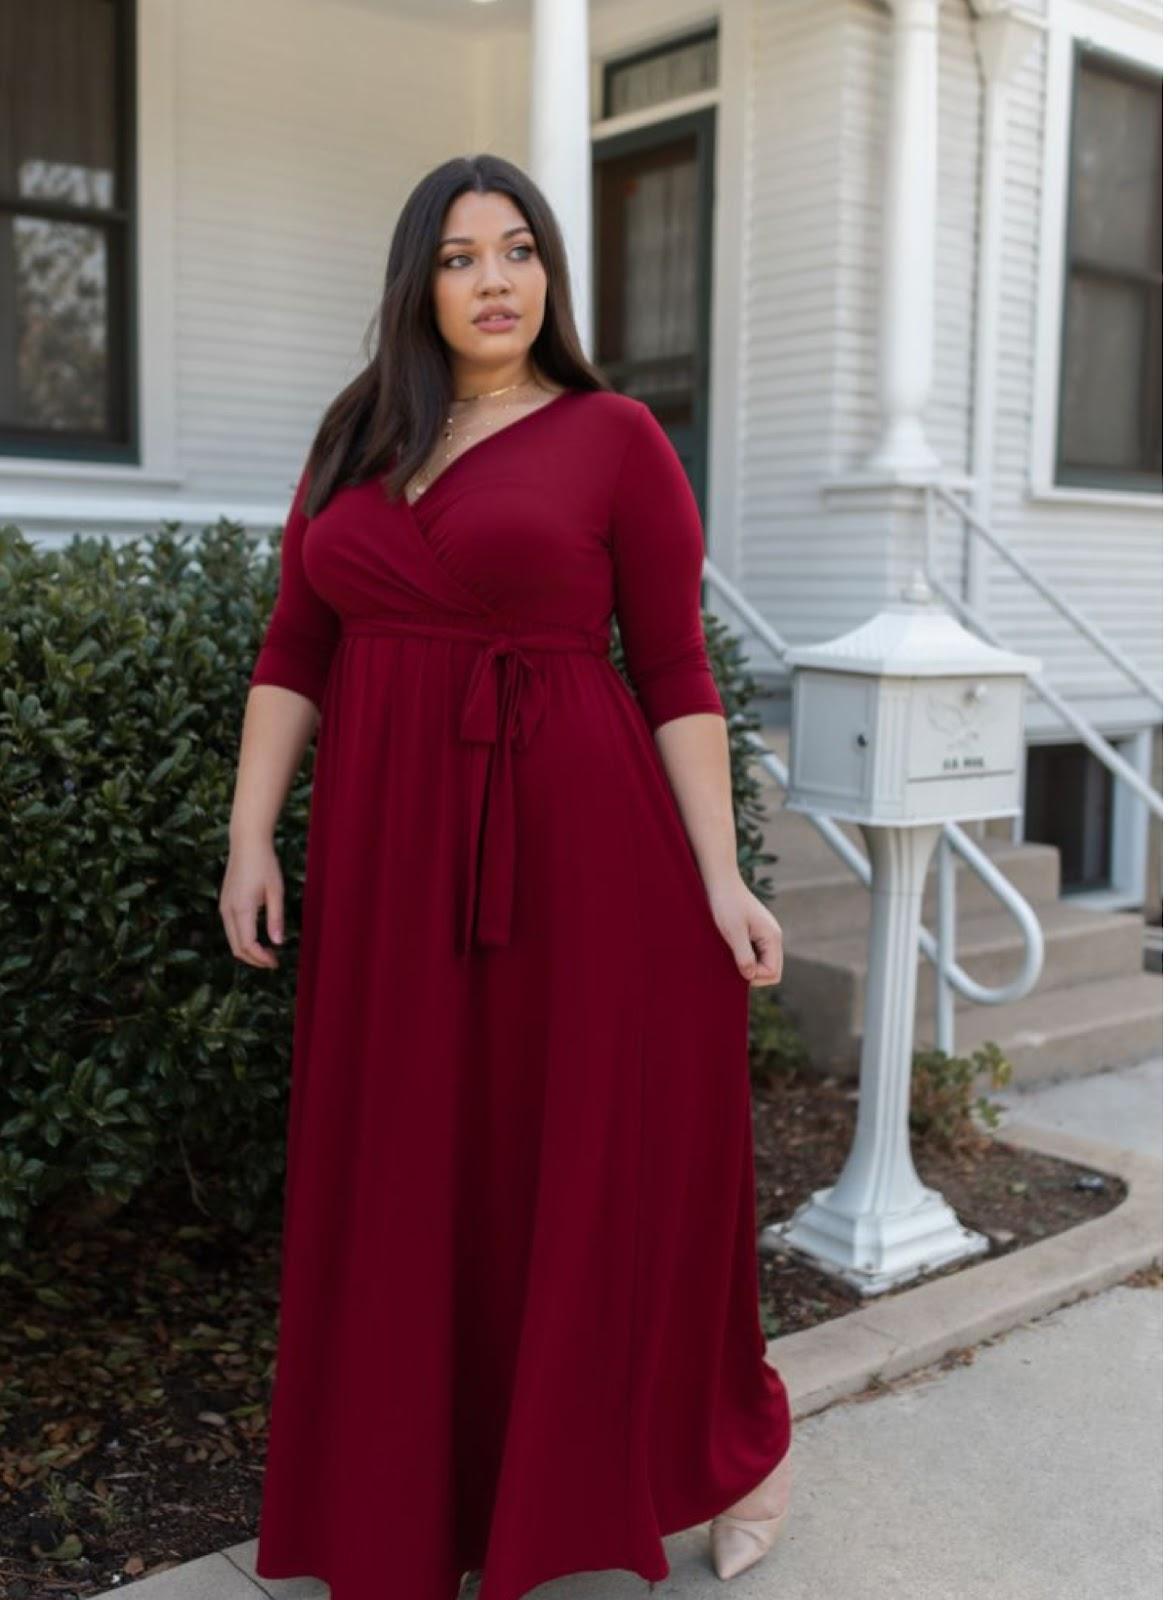 A woman is wearing a dark red wrap dress